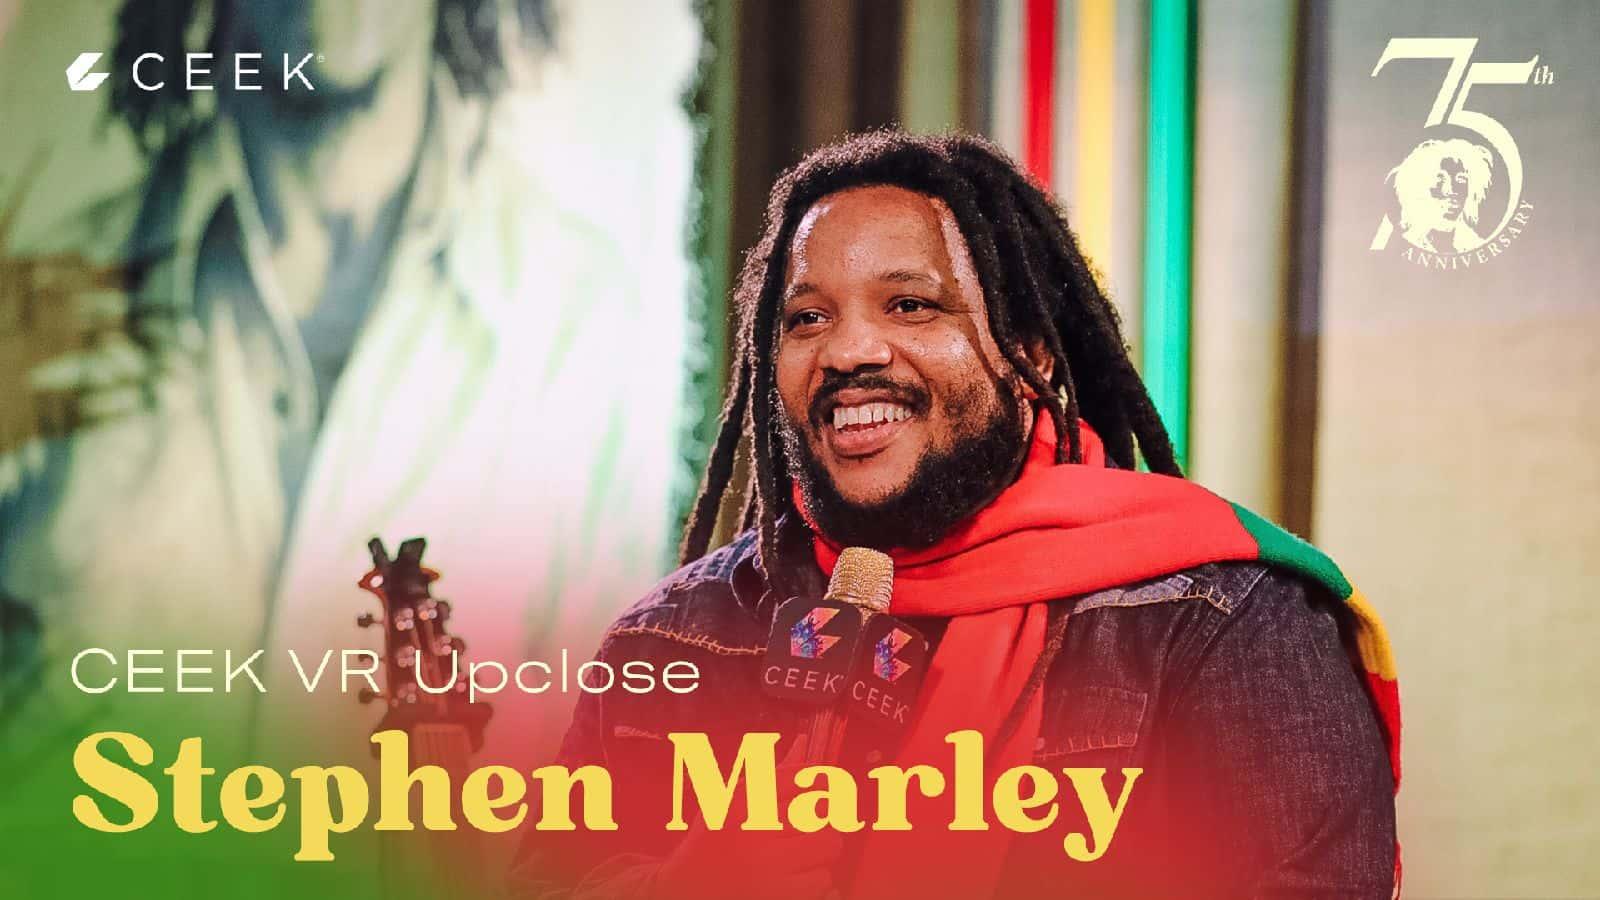 Stephen Marley Upclose